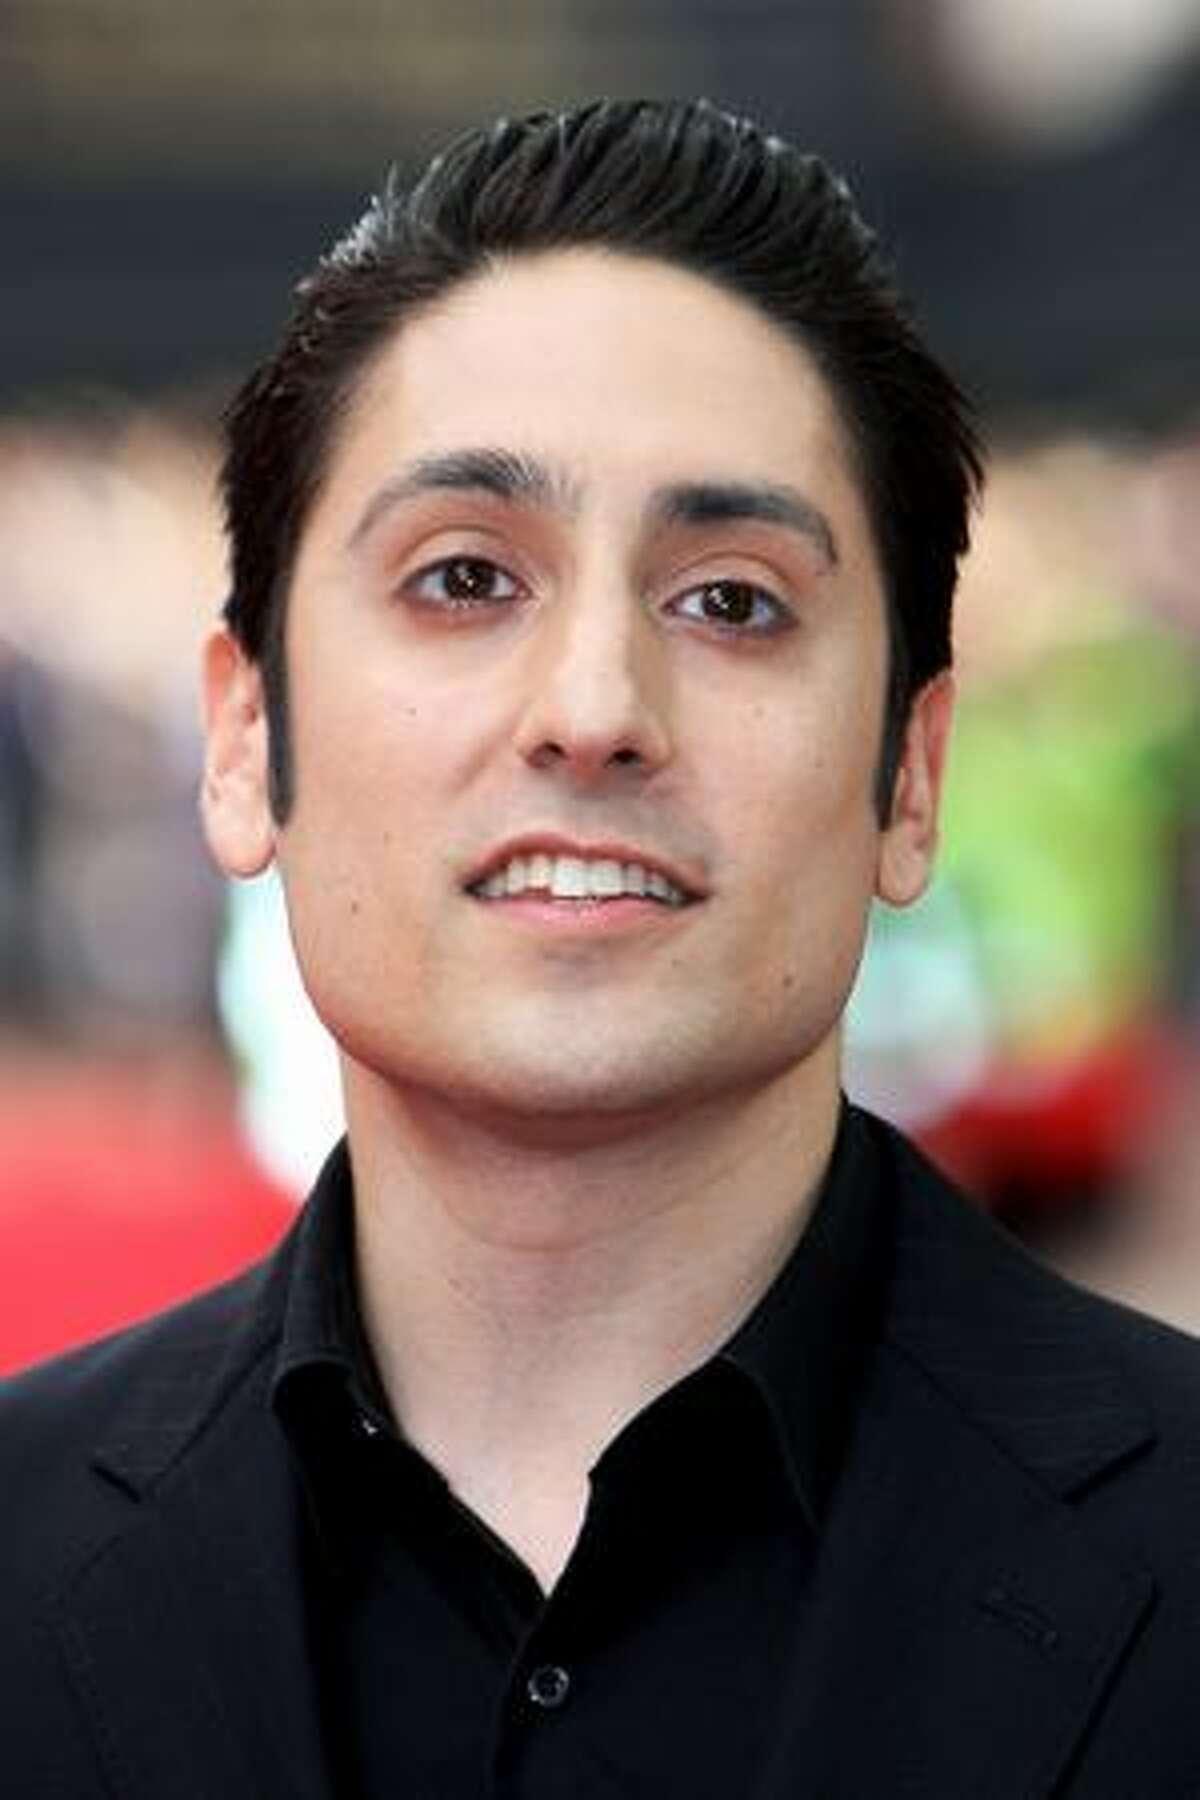 Actor Omar Doom attends the UK film premiere of